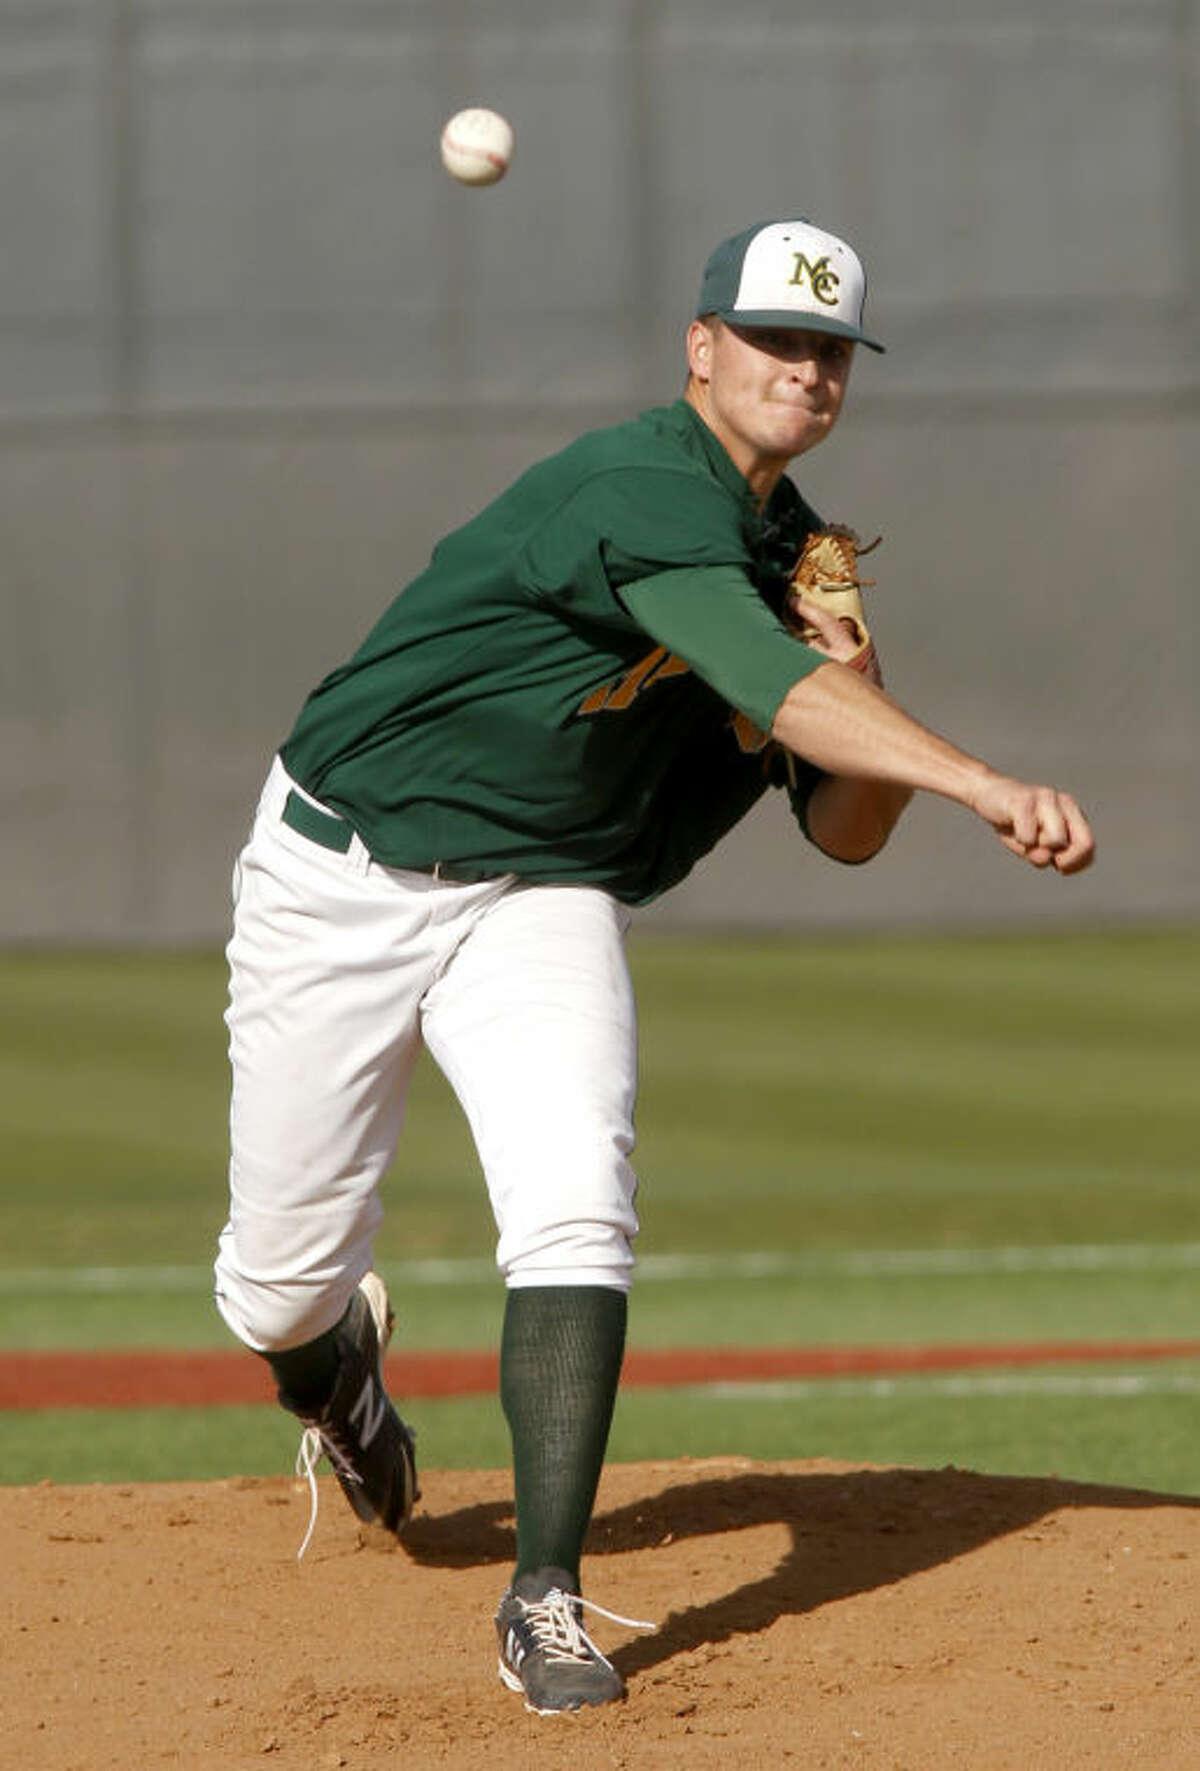 Midland College's Michael Brosig pitches against New Mexico Junior College March 7 at Christensen Stadium. James Durbin/Reporter-Telegram